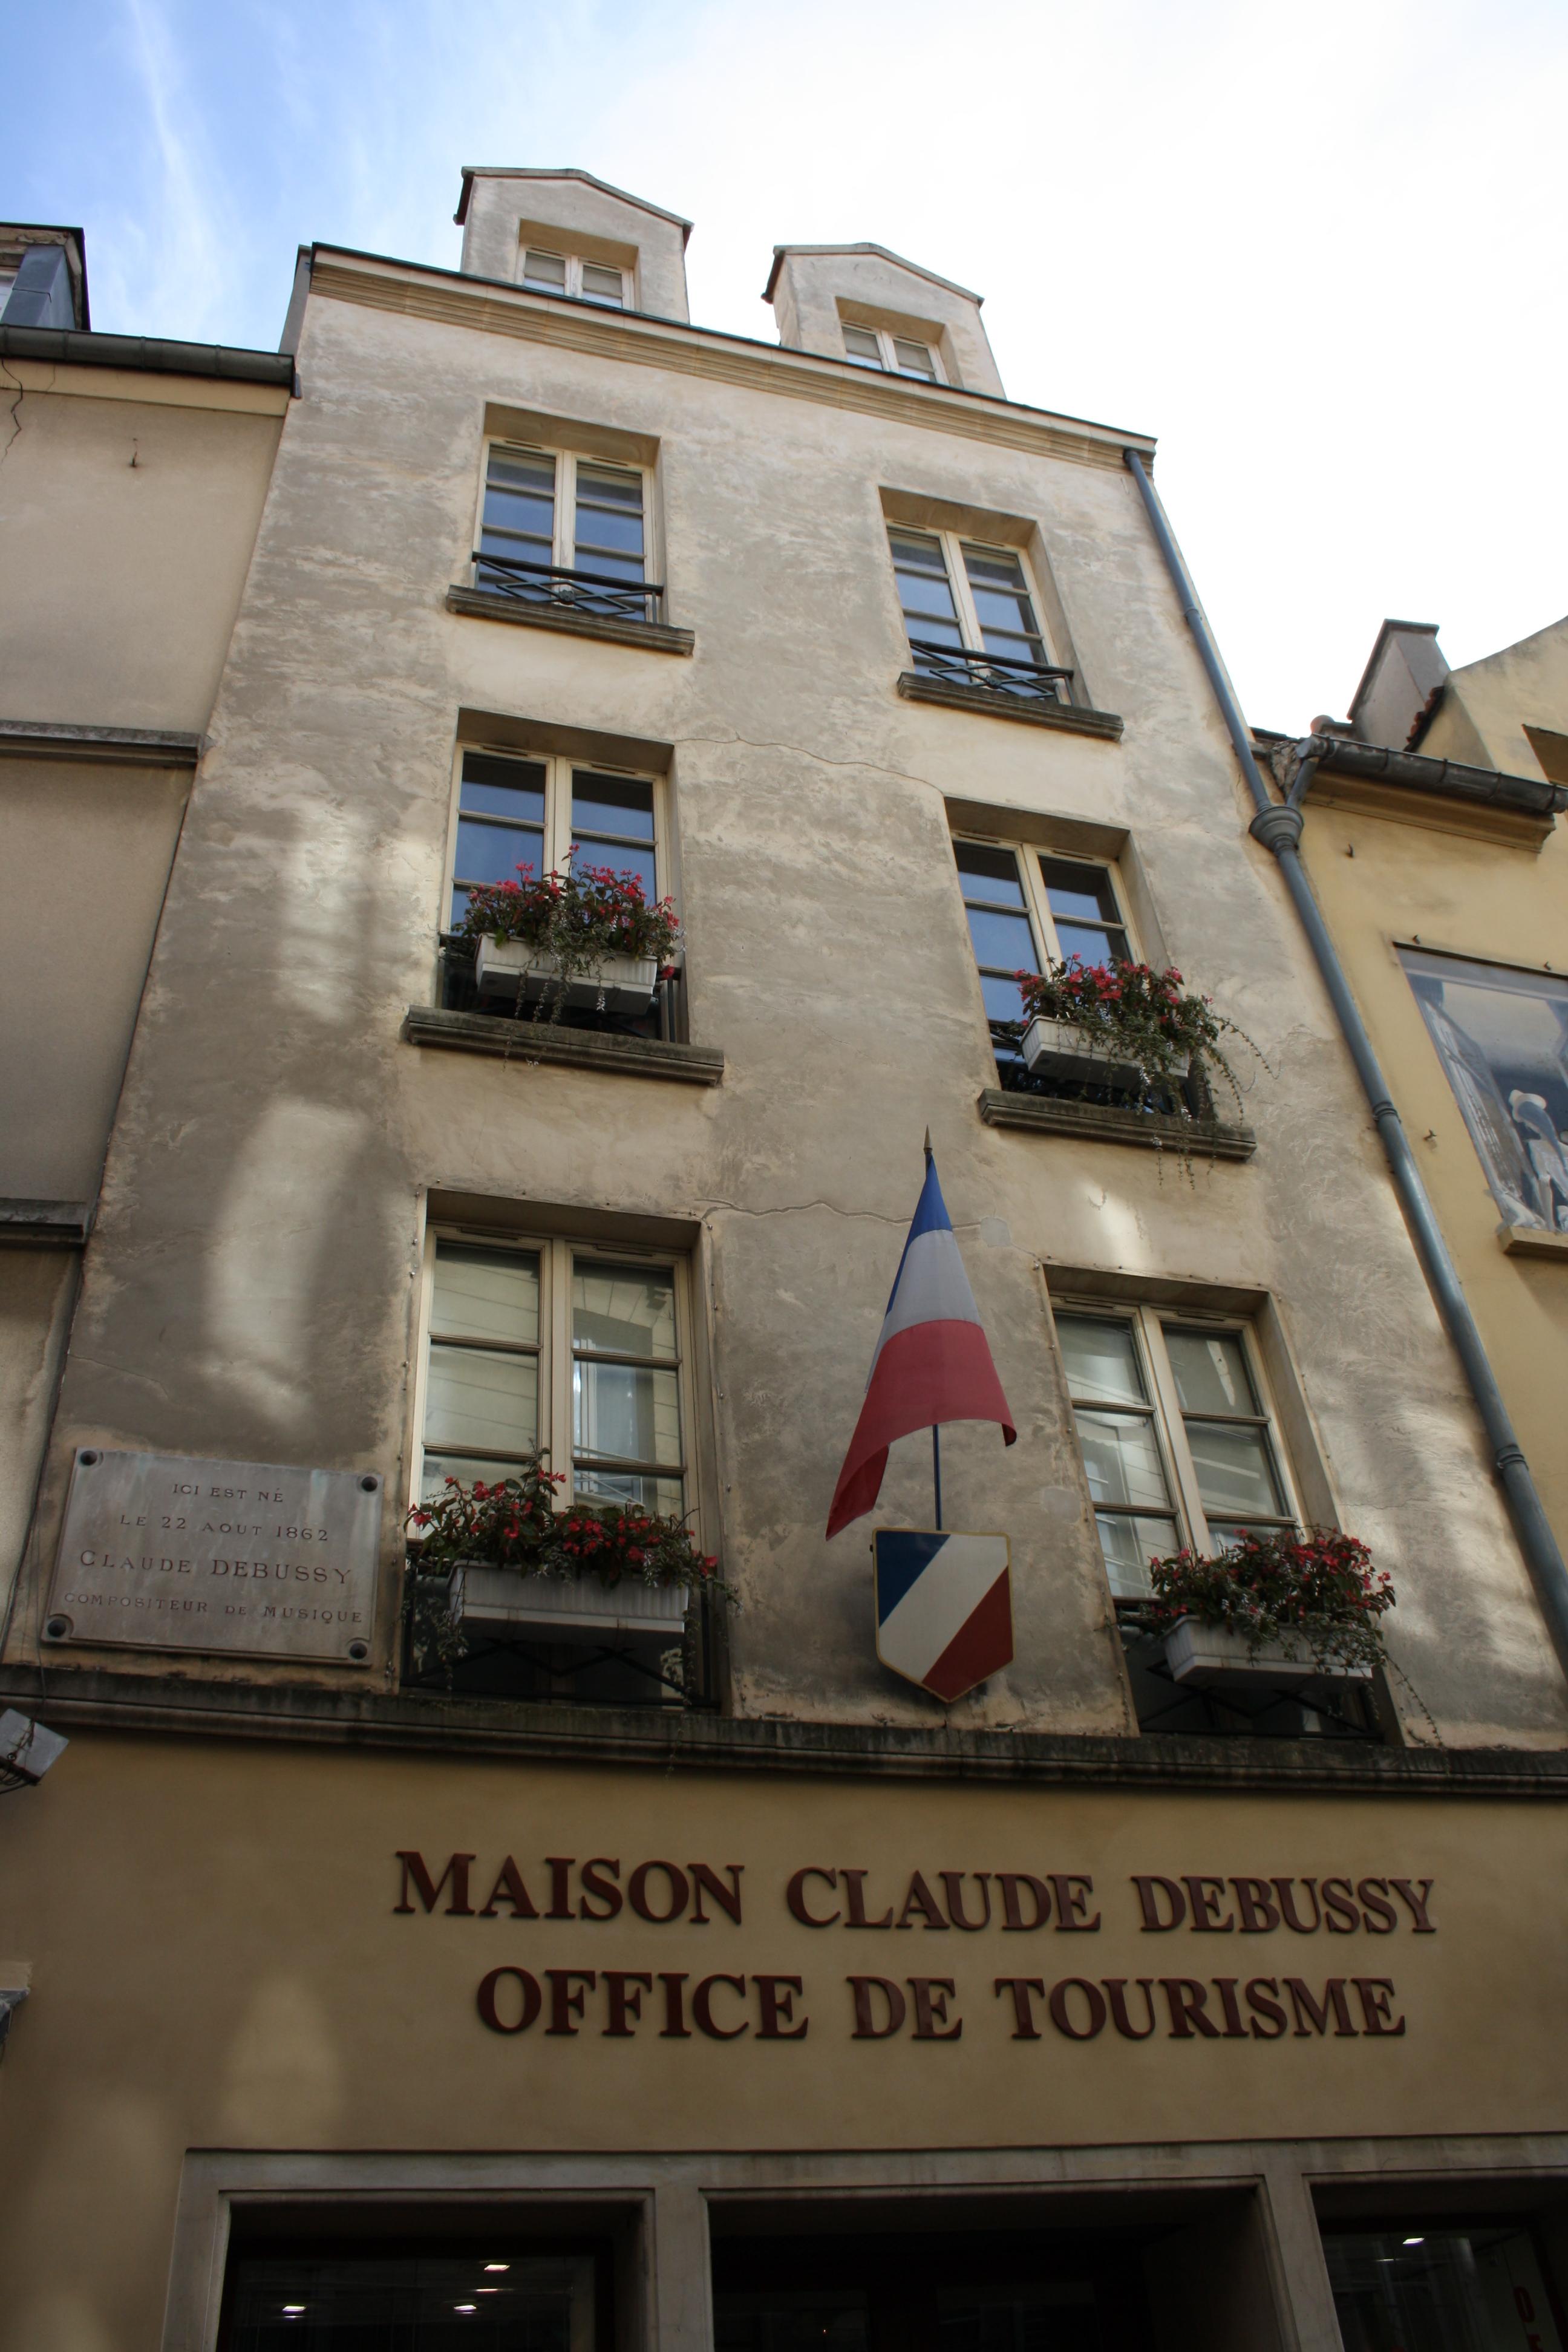 File saint germain en laye maison claude debussy 2011 - Office du tourisme st germain en laye ...